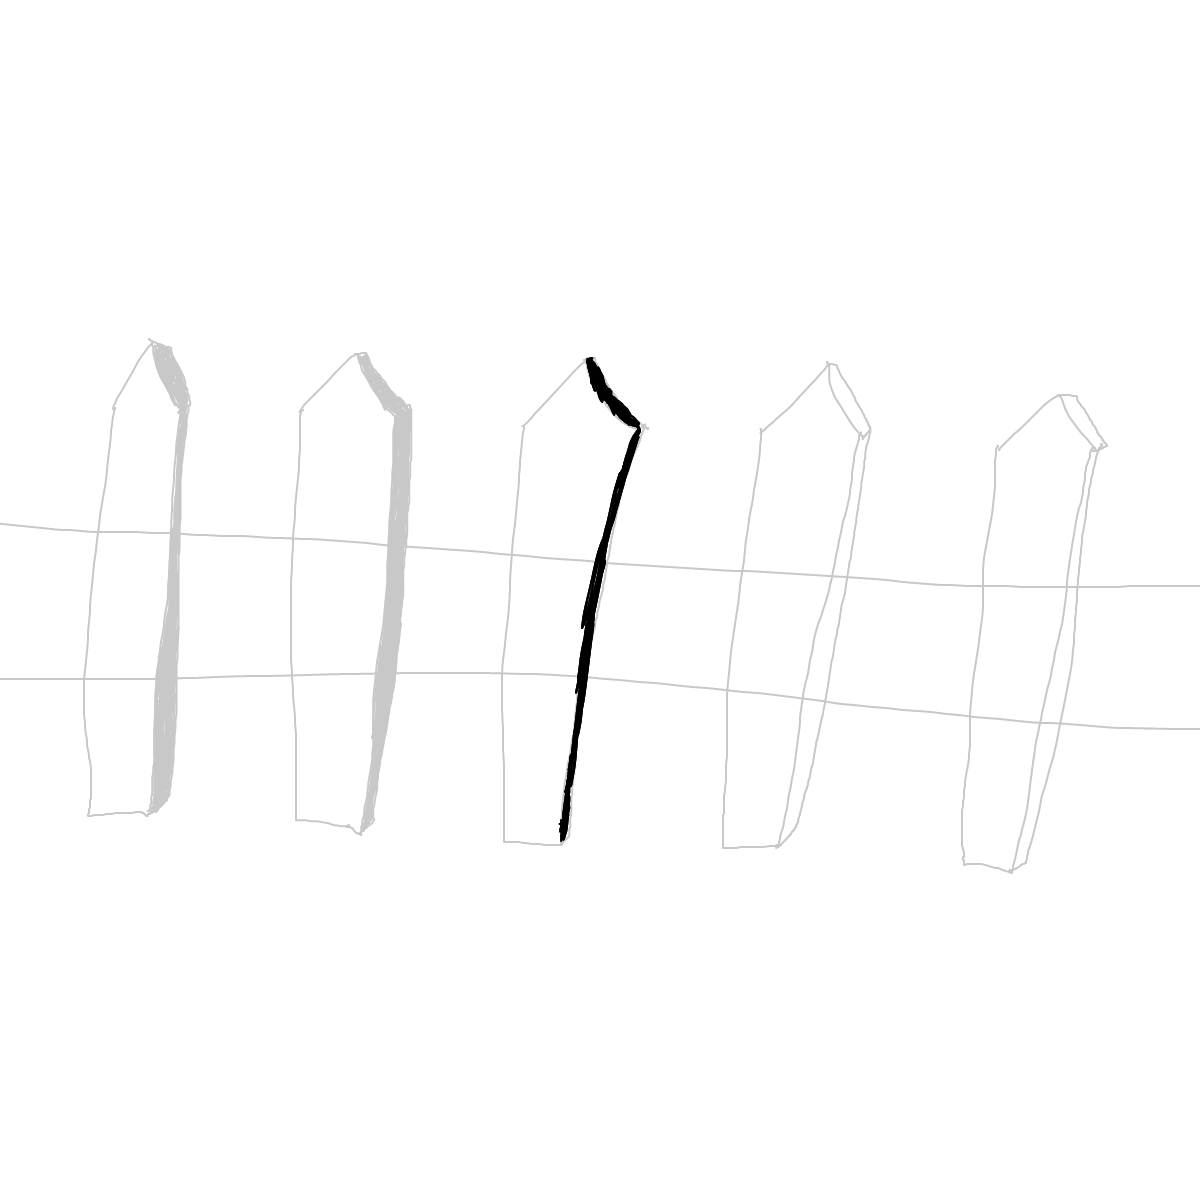 BAAAM drawing#9370 lat:52.4750595092773440lng: 13.4070663452148440